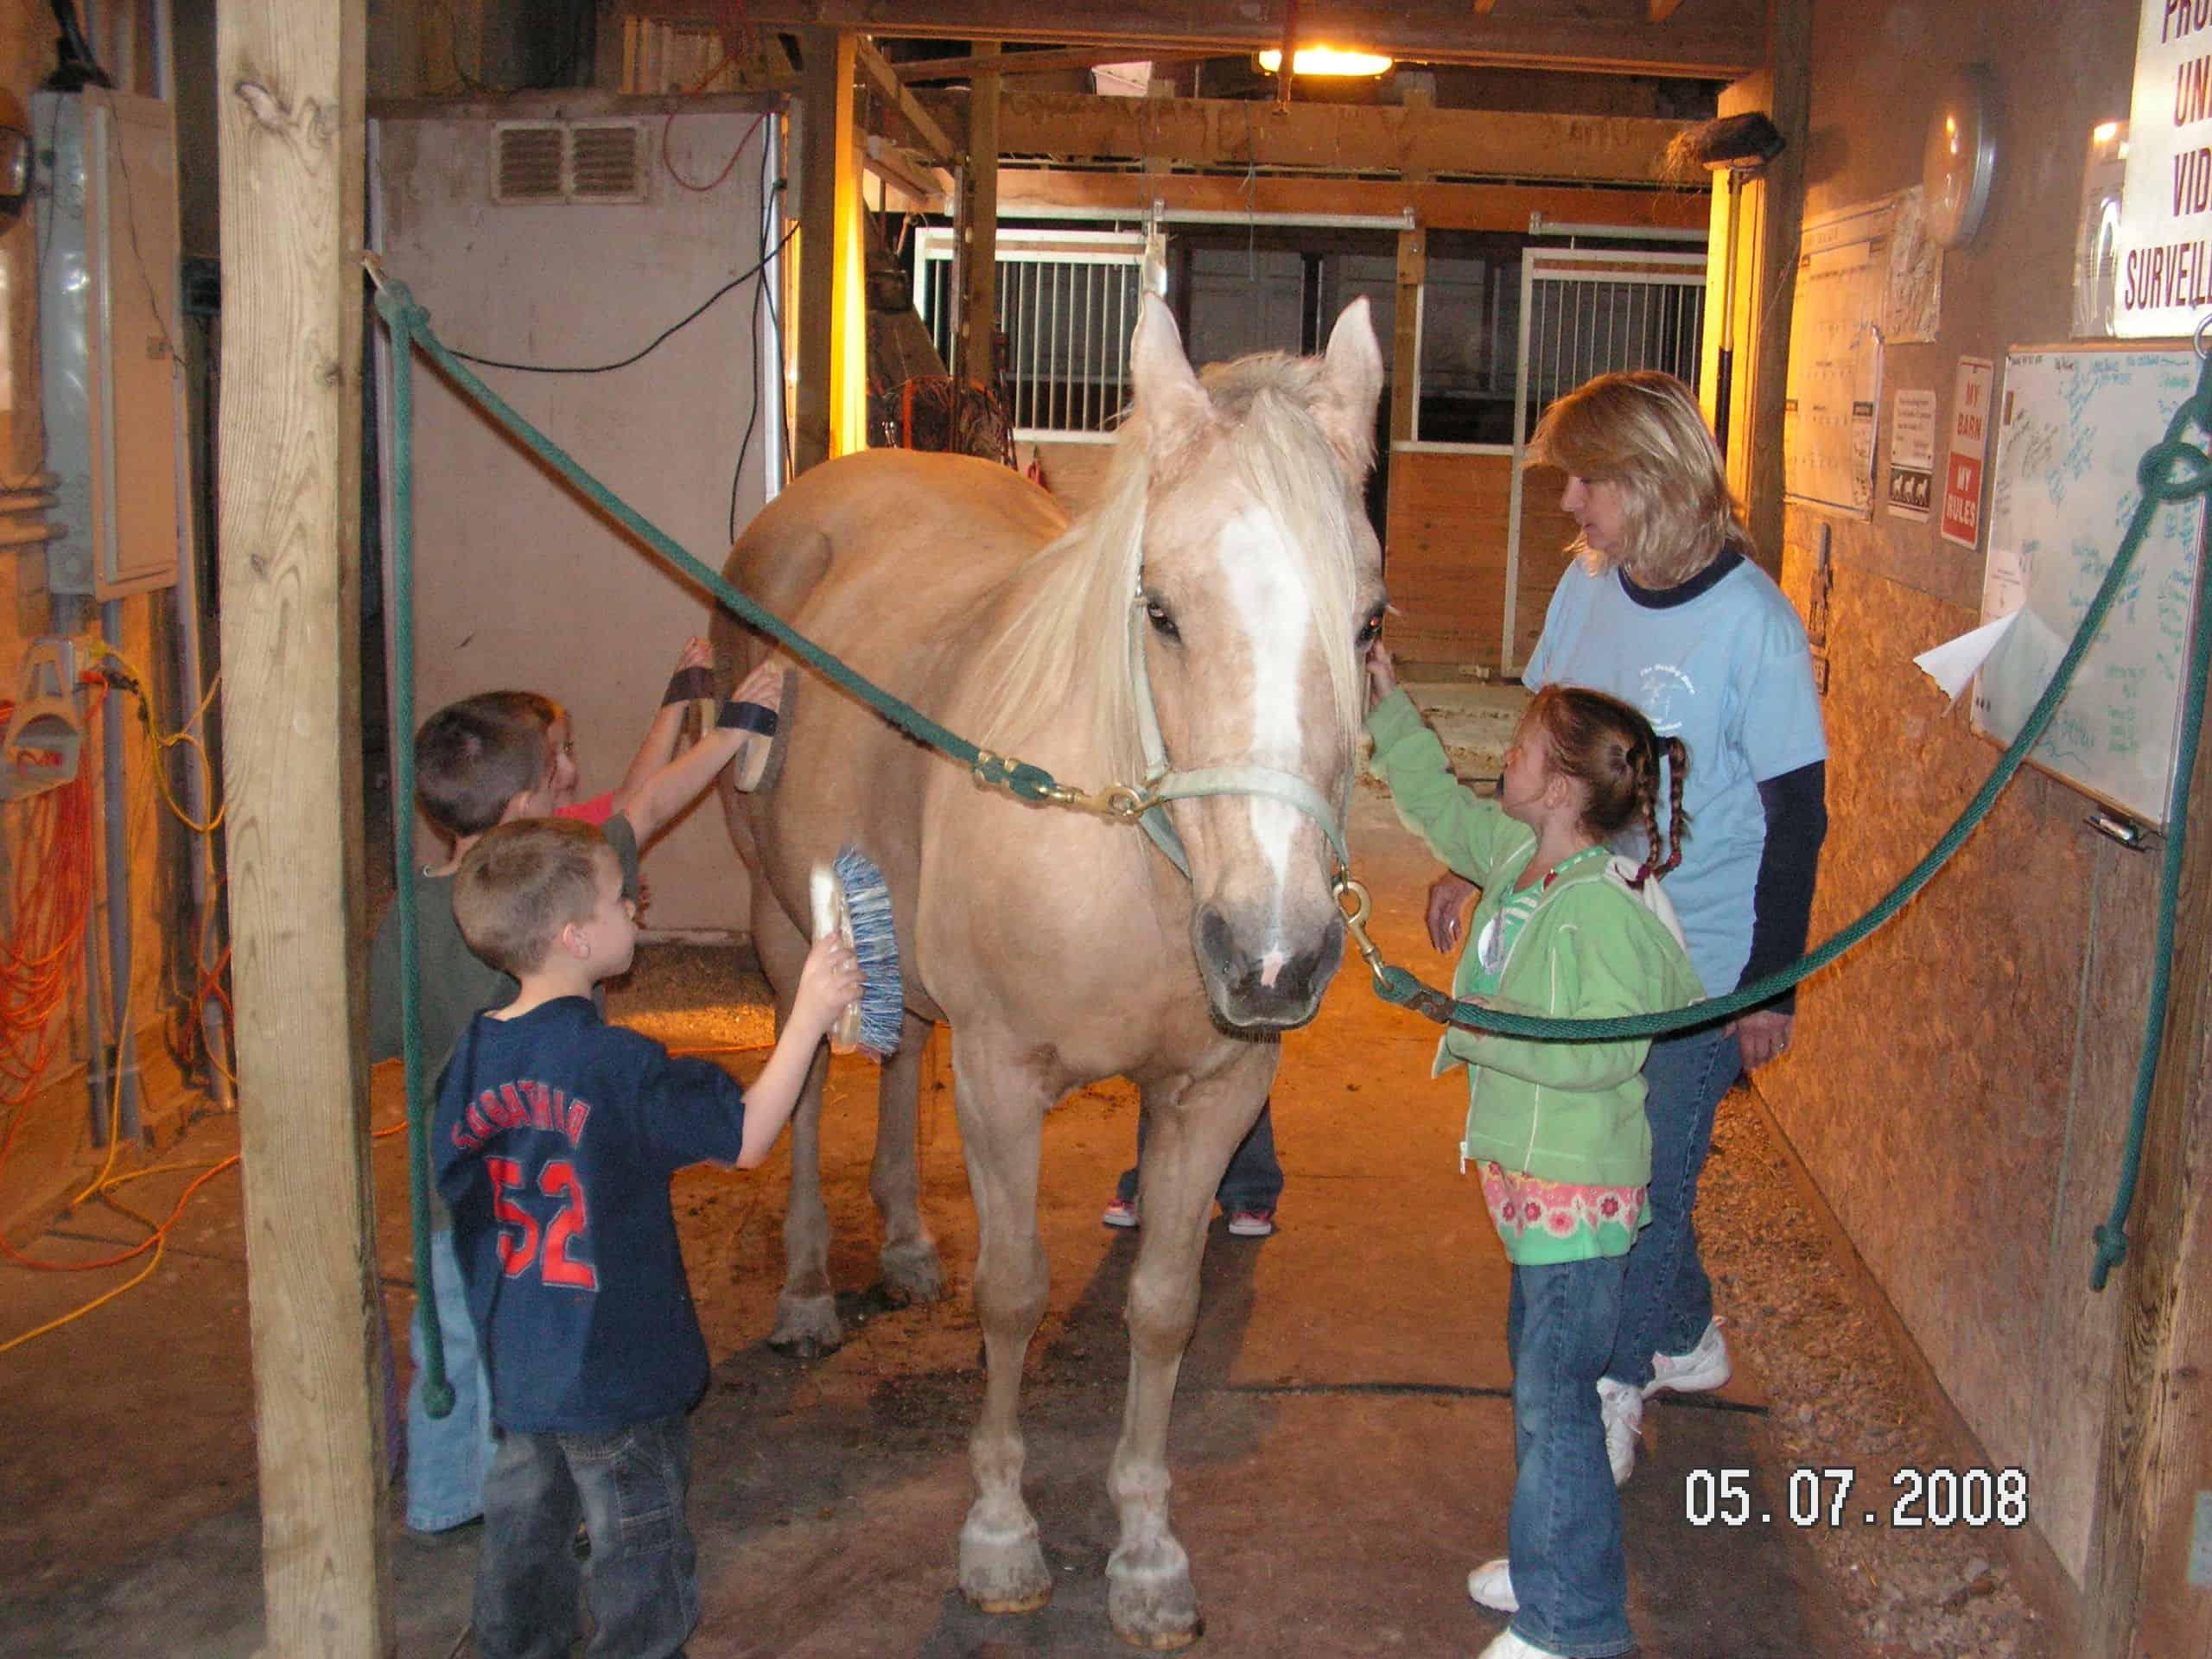 abuse women children horses the healing barnabuse women children horses